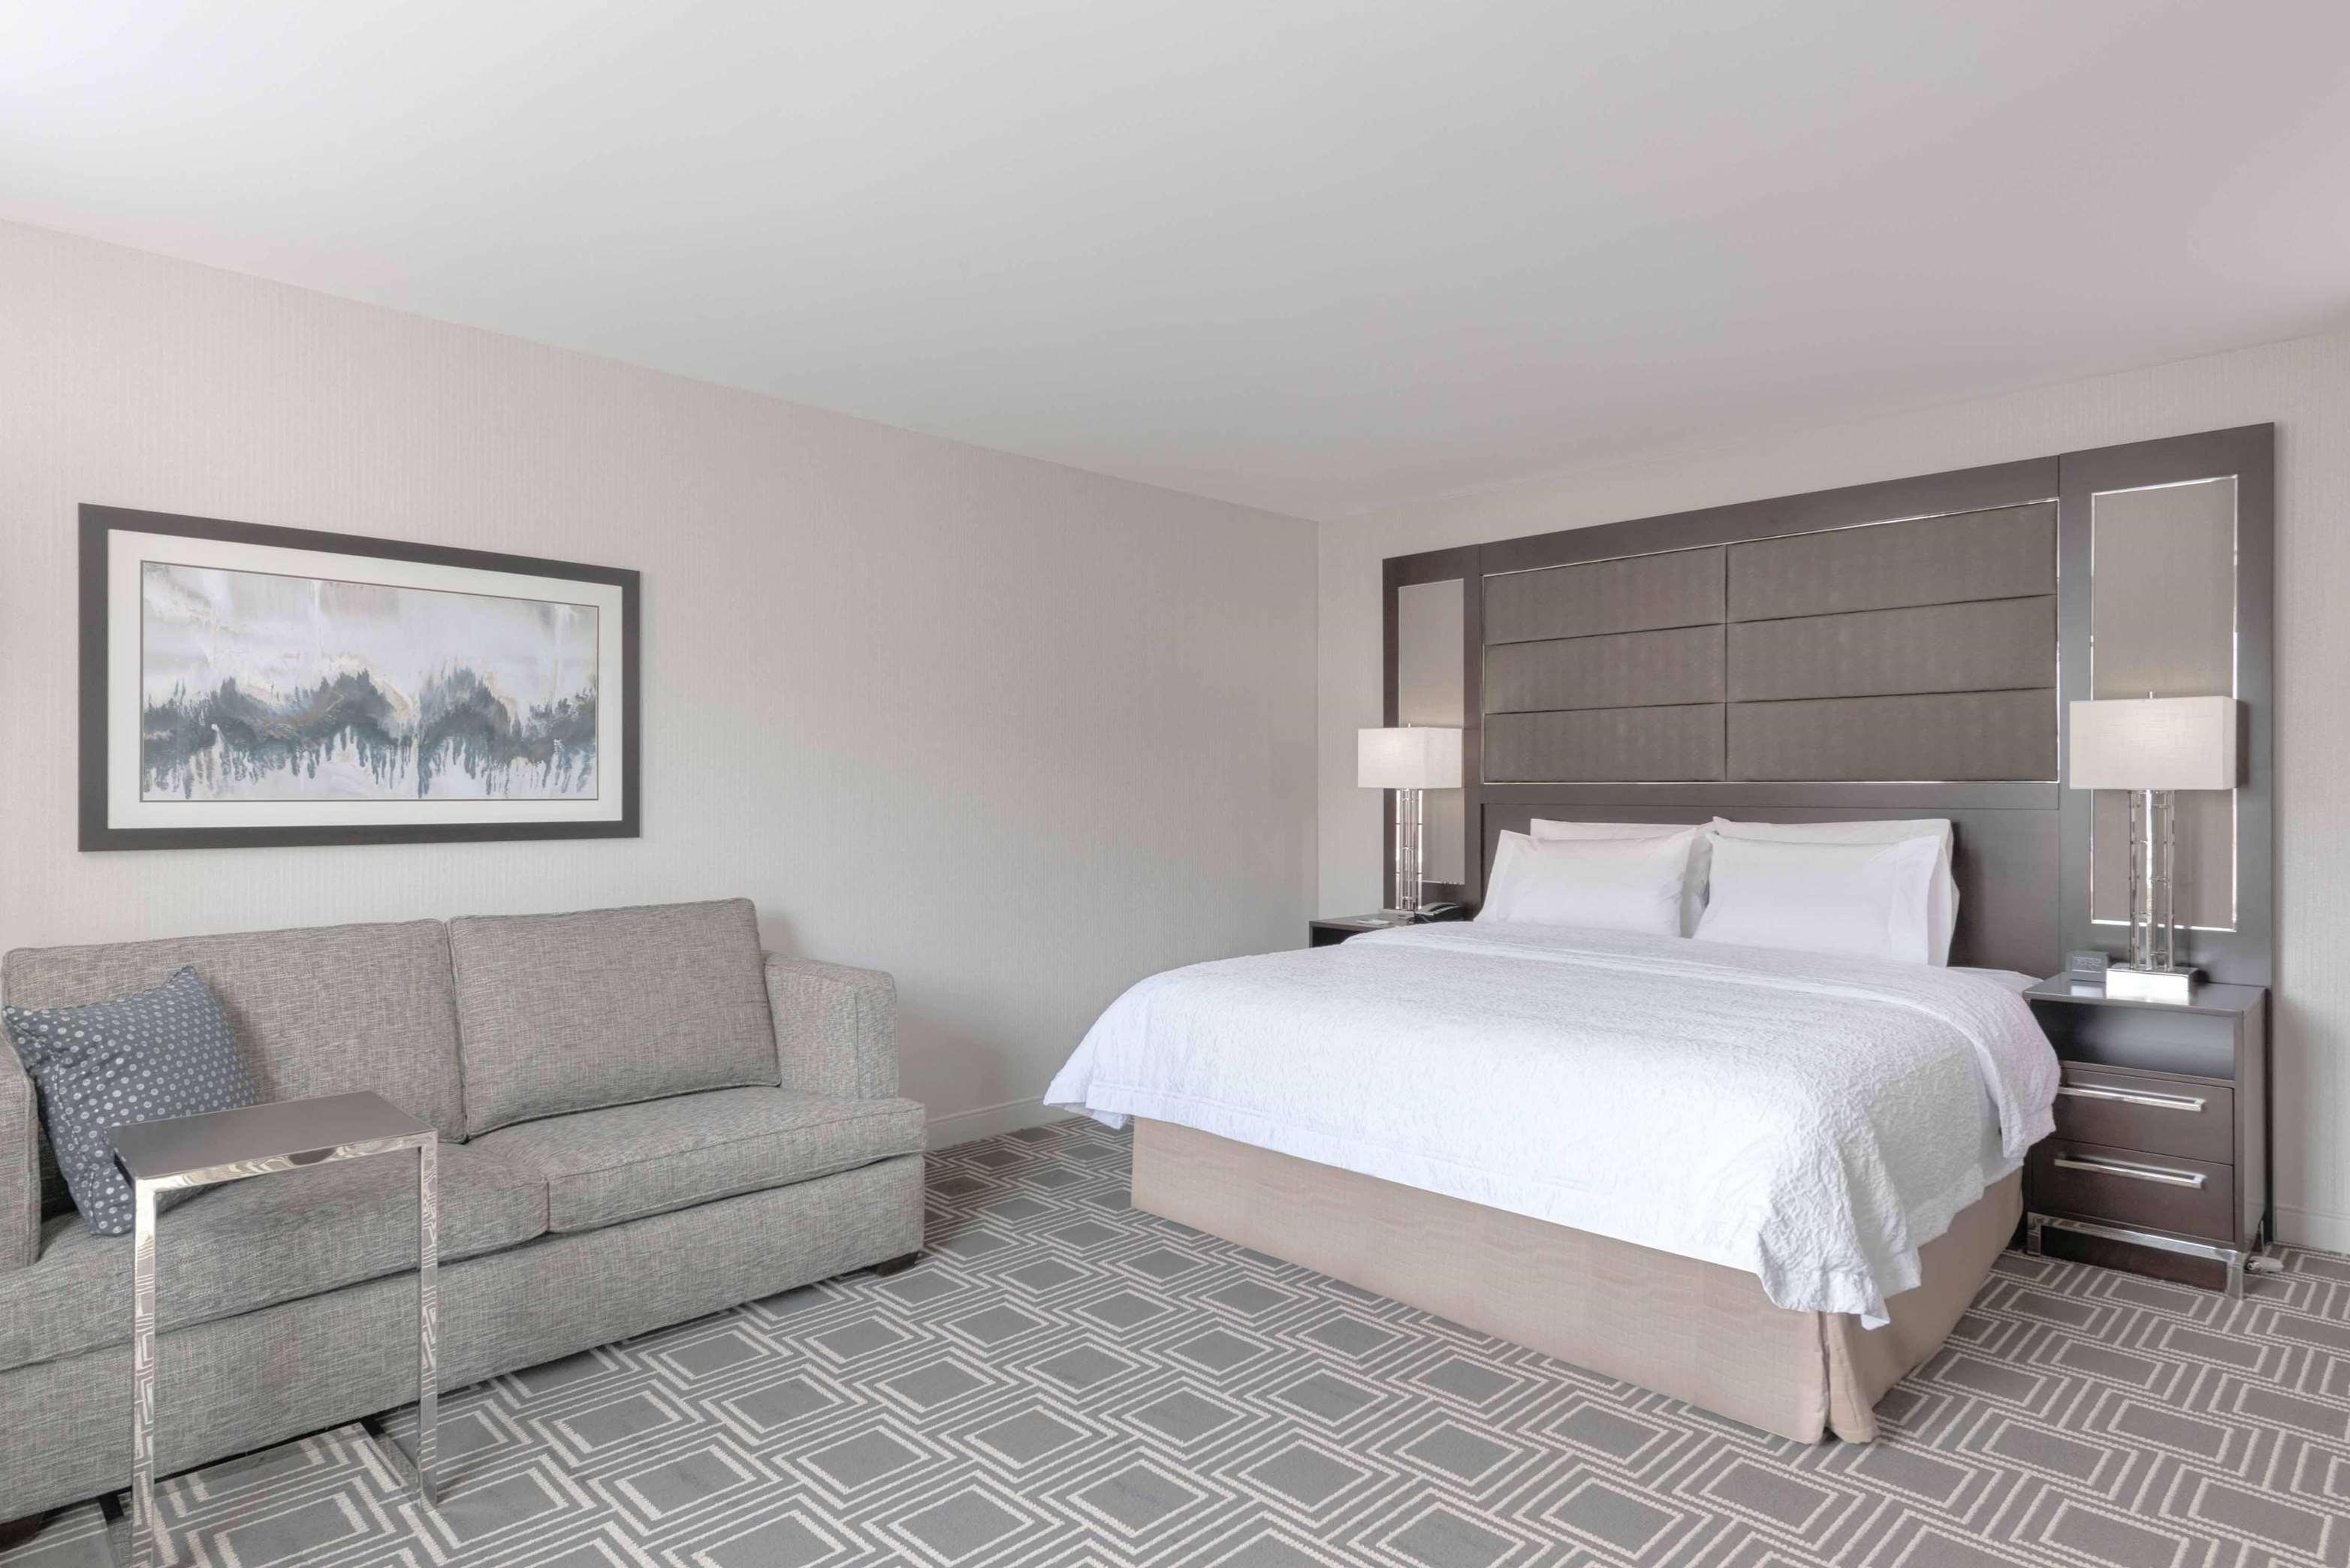 Hampton Inn & Suites Worcester image 23